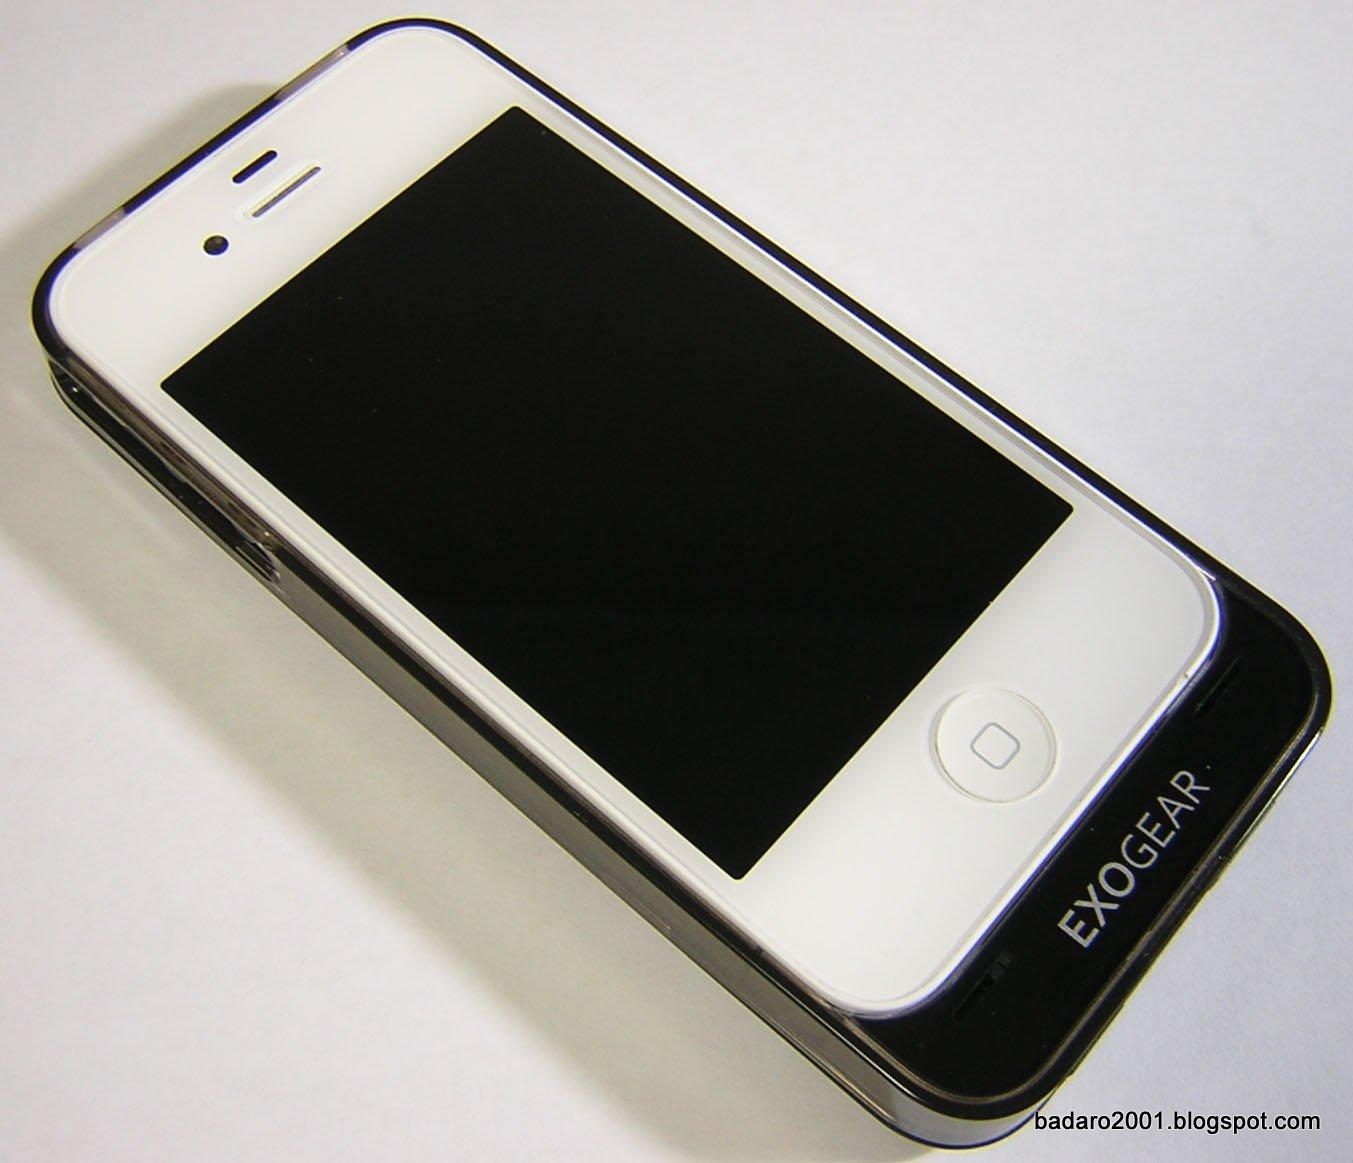 badaro...: 아이폰4 보조배터리 케이스형 1700mAh Exolife4, 묵직한 ...